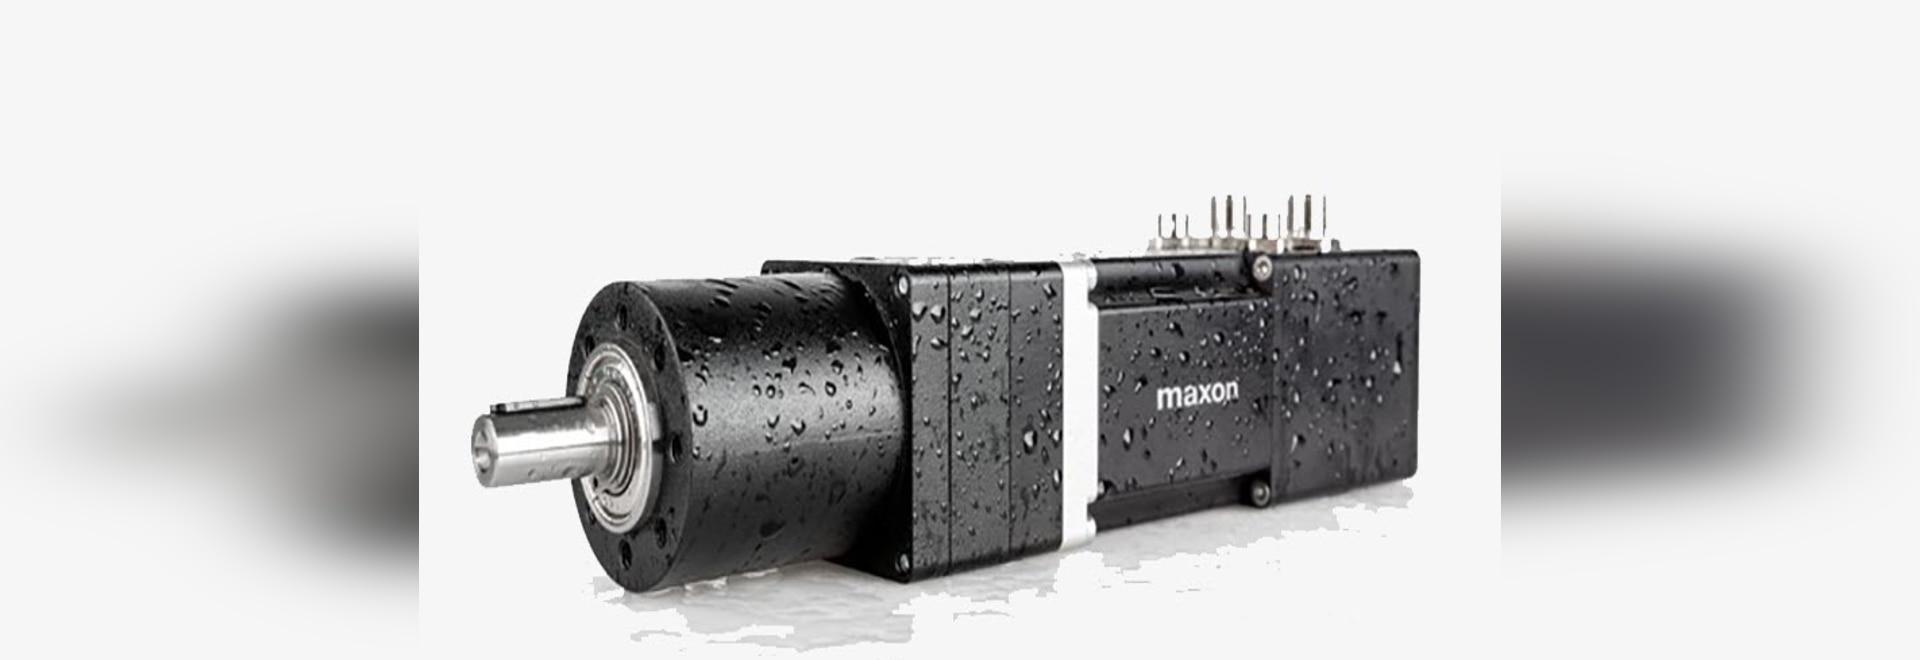 Maxon bietet IDX Compact Drive an